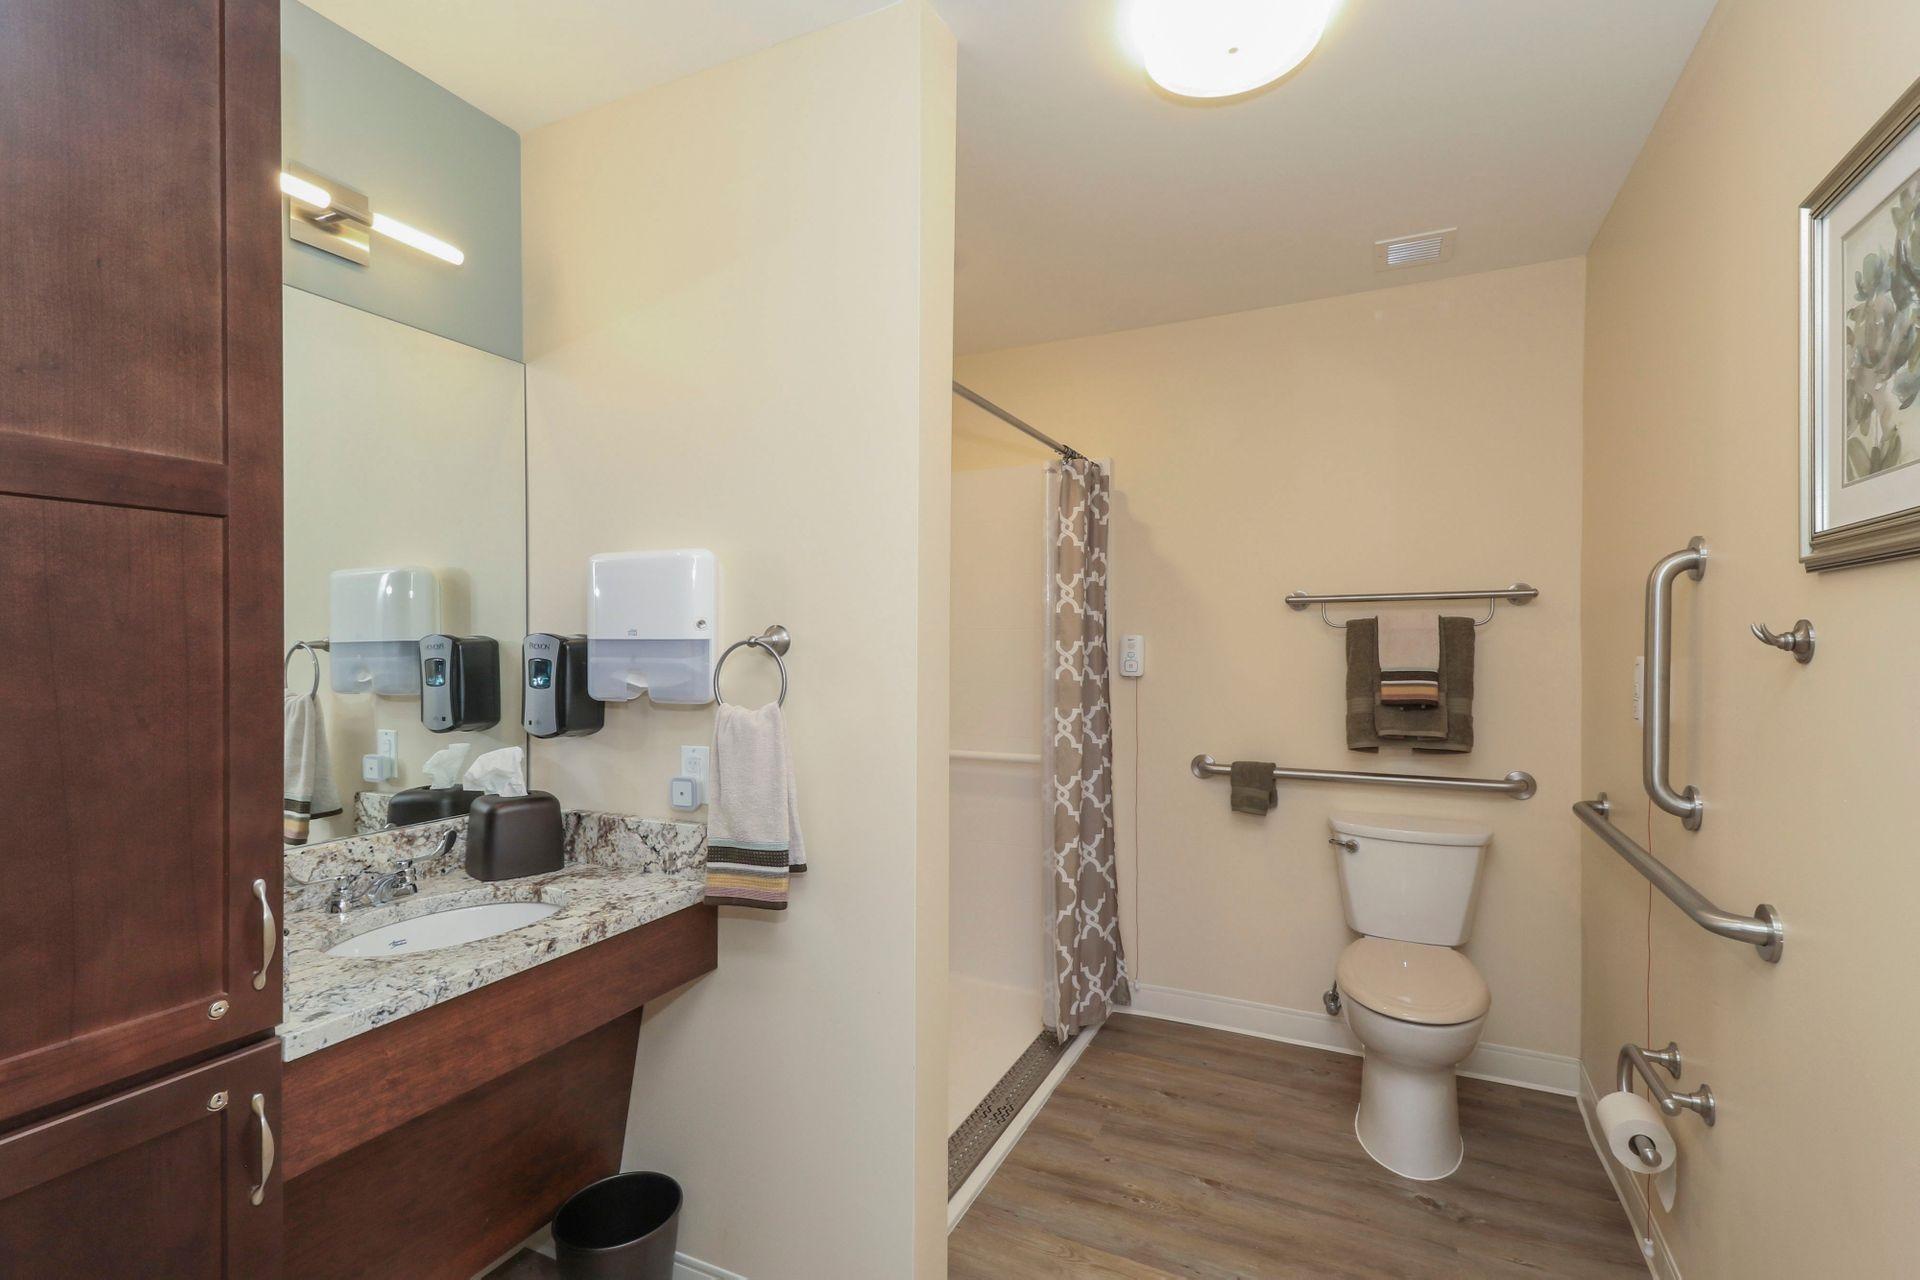 smt-model-bathroom.jpg